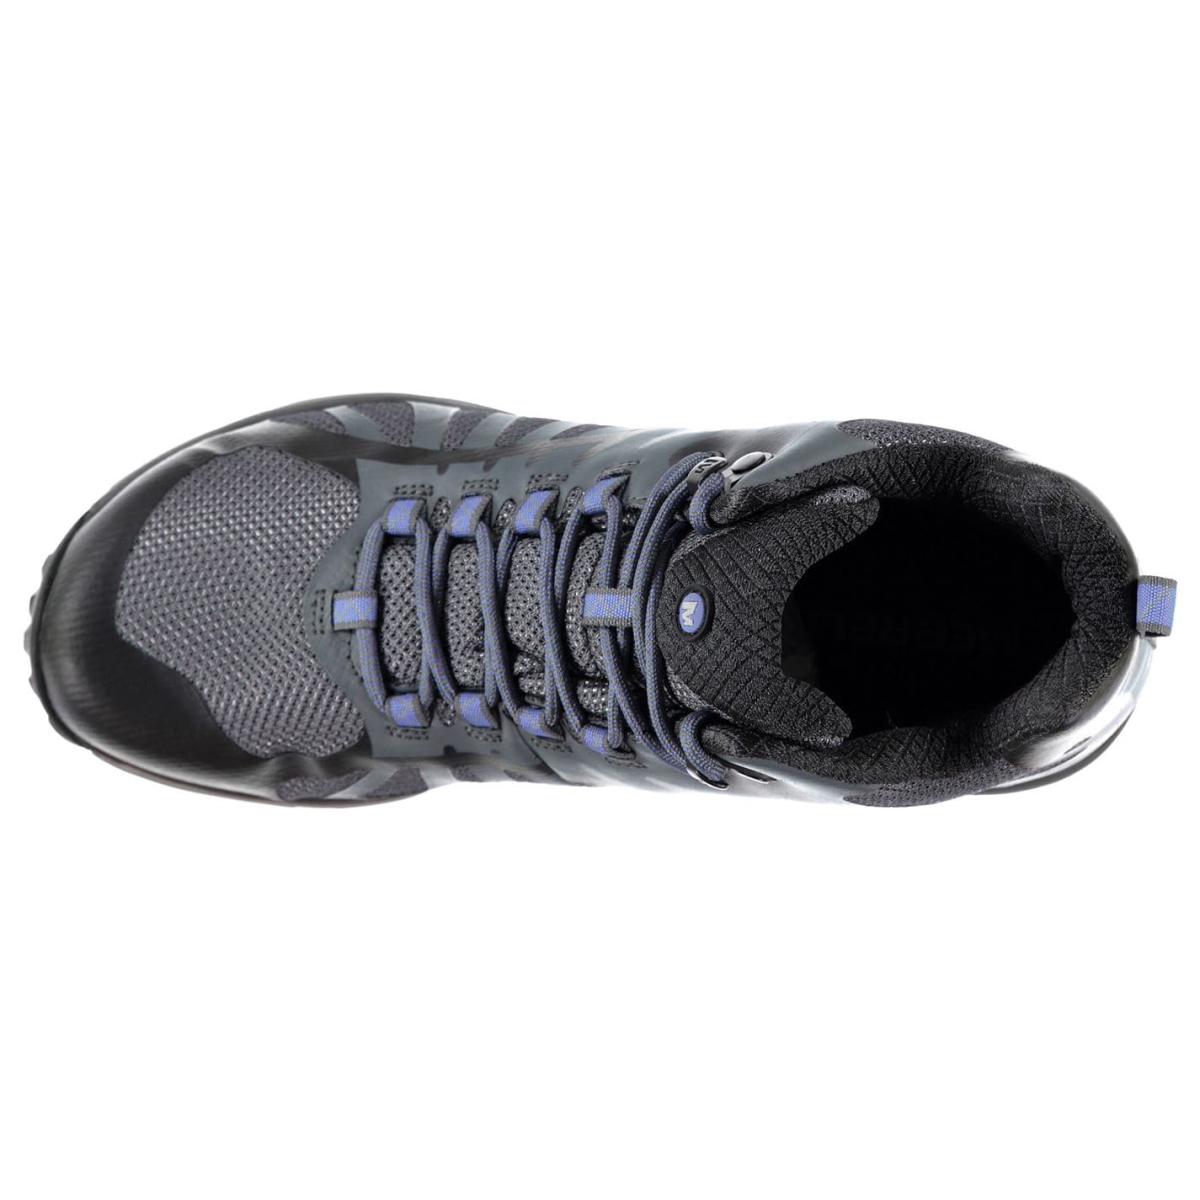 Merrell-Edge-Mid-Turnschuhe-Damen-Sneaker-Sportschuhe-Laufschuhe-9014 Indexbild 4